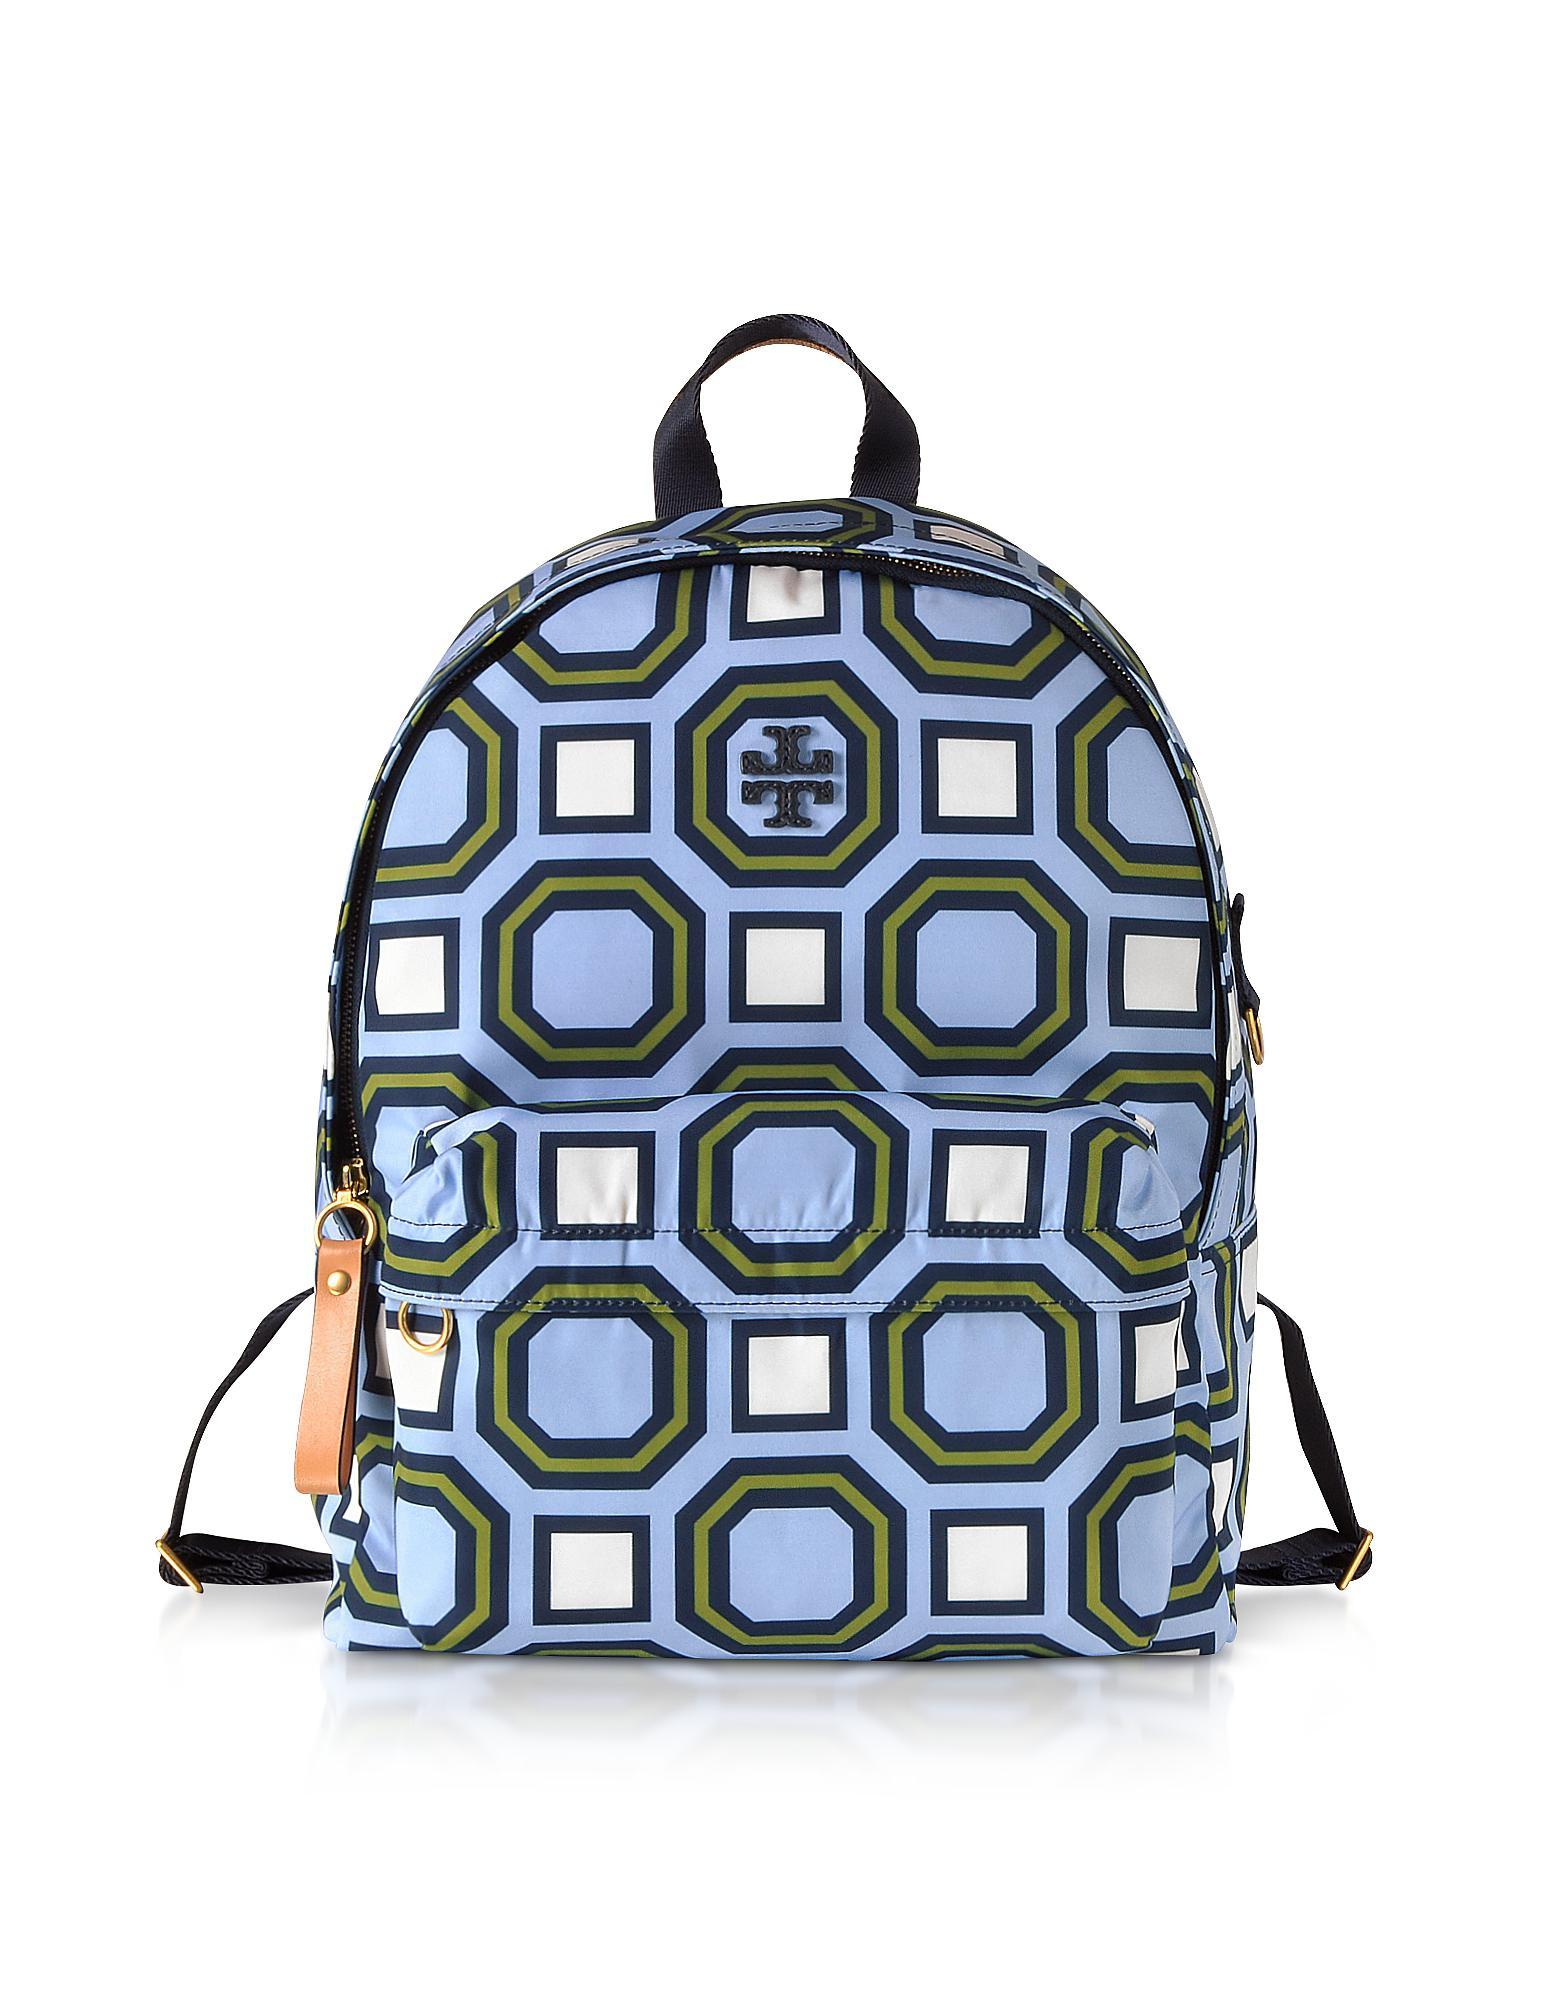 f4c583b18cf Tory Burch Octagon Square Print Nylon Backpack in Blue - Lyst